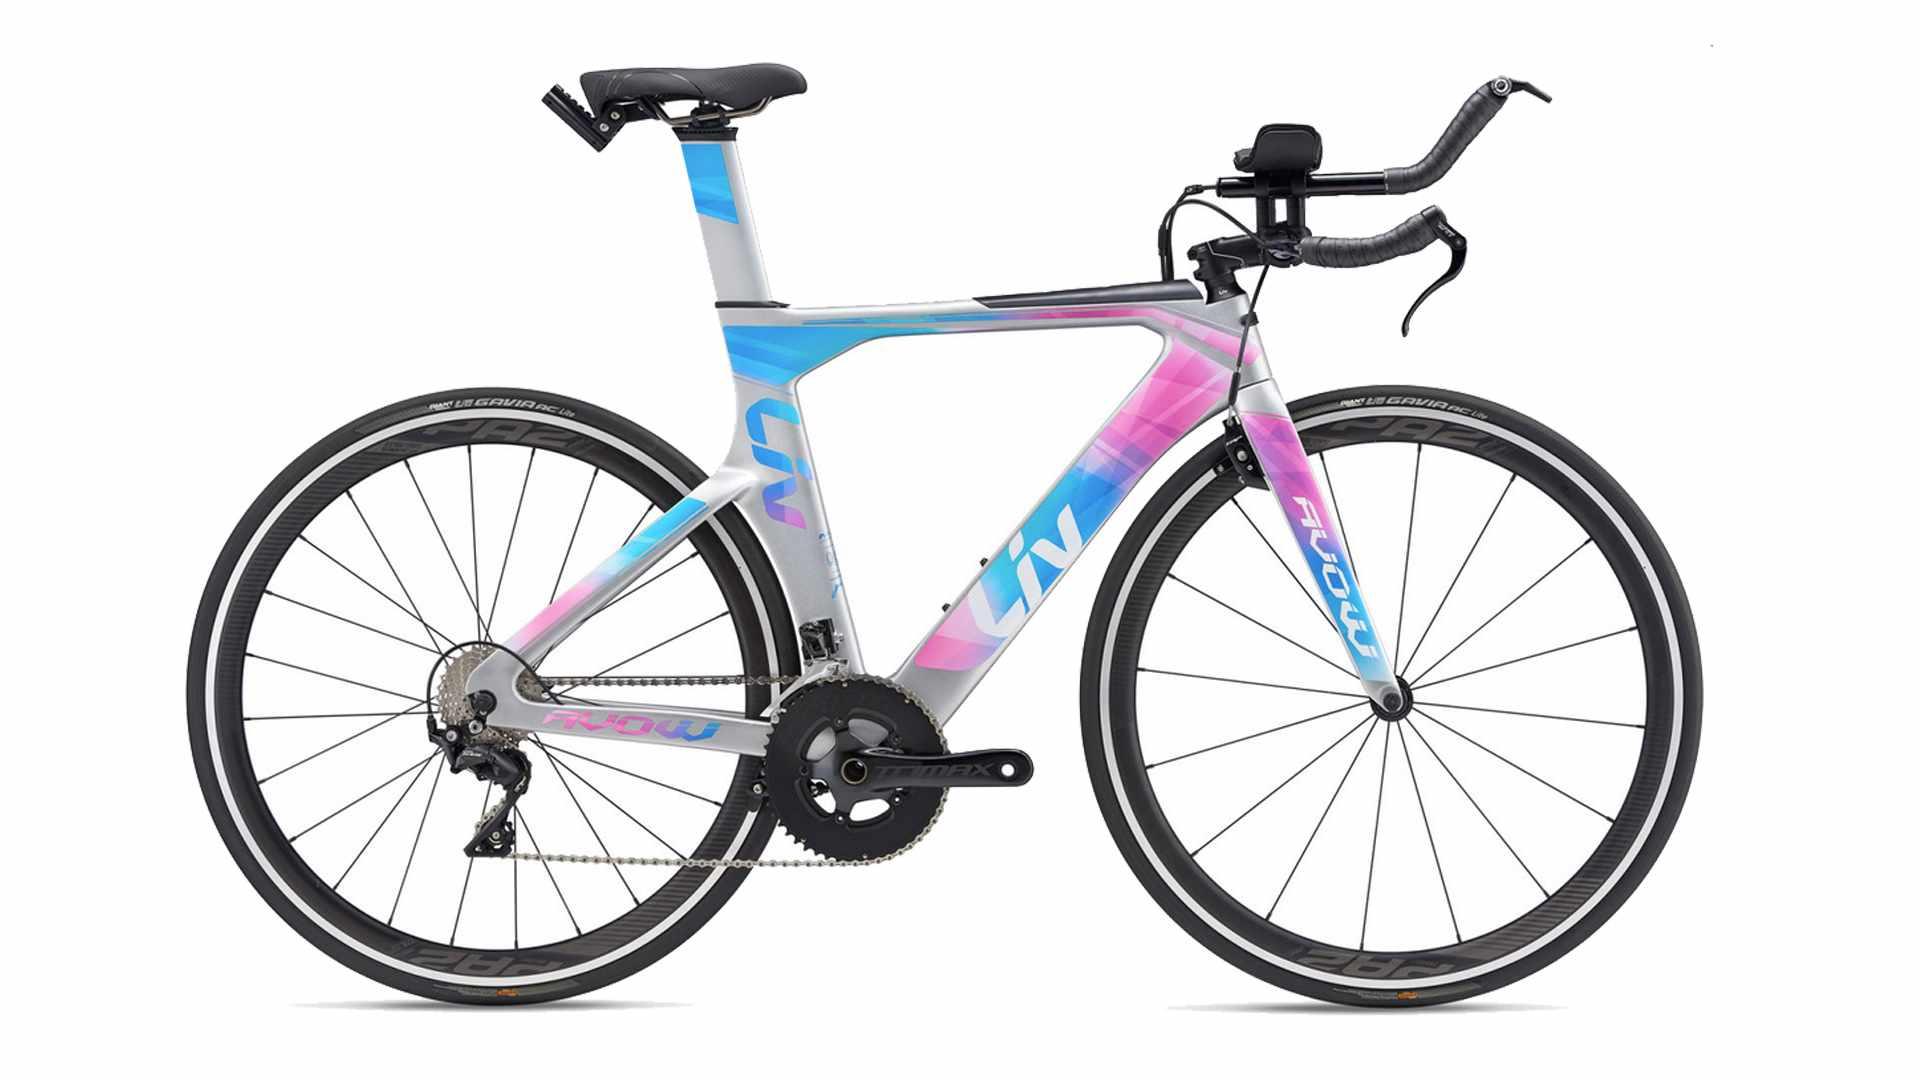 Blue, pink and silver triathlon